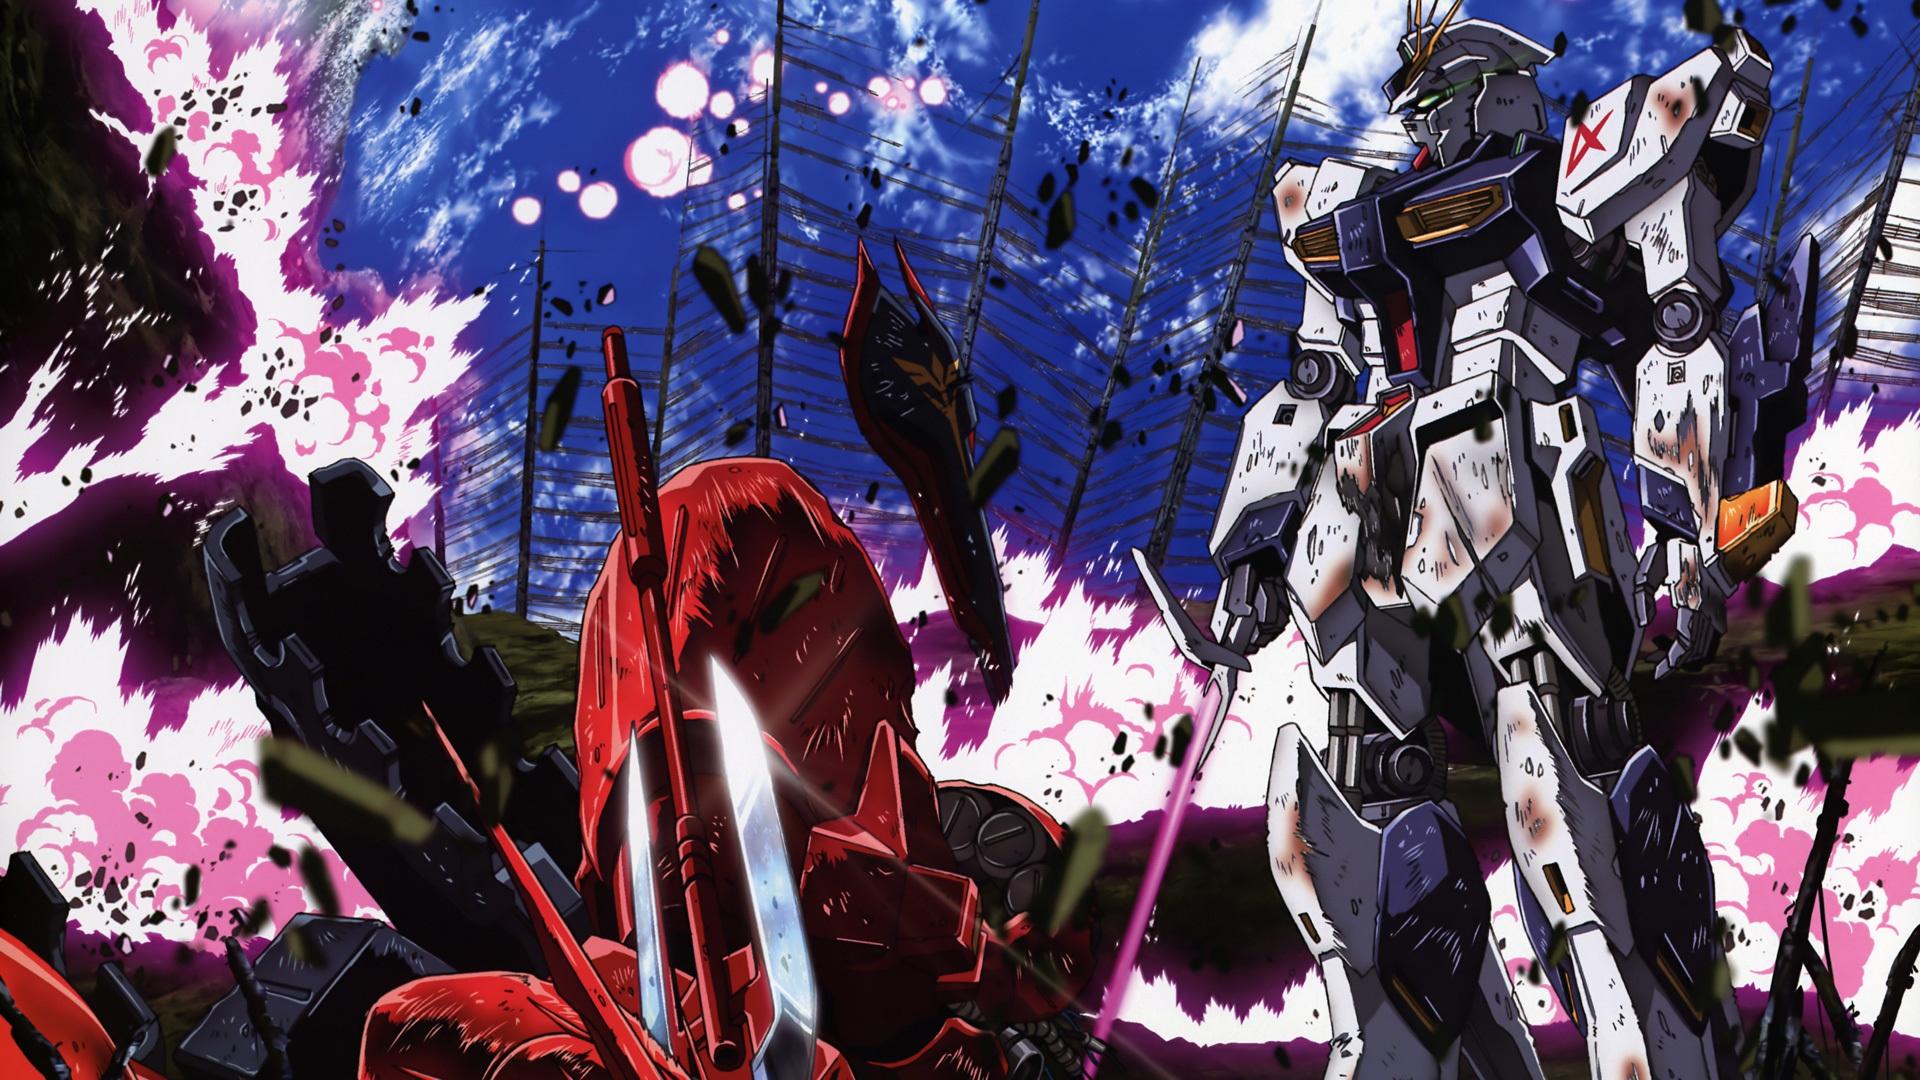 Iphone Sayings Wallpaper Gundam Computer Wallpapers Desktop Backgrounds